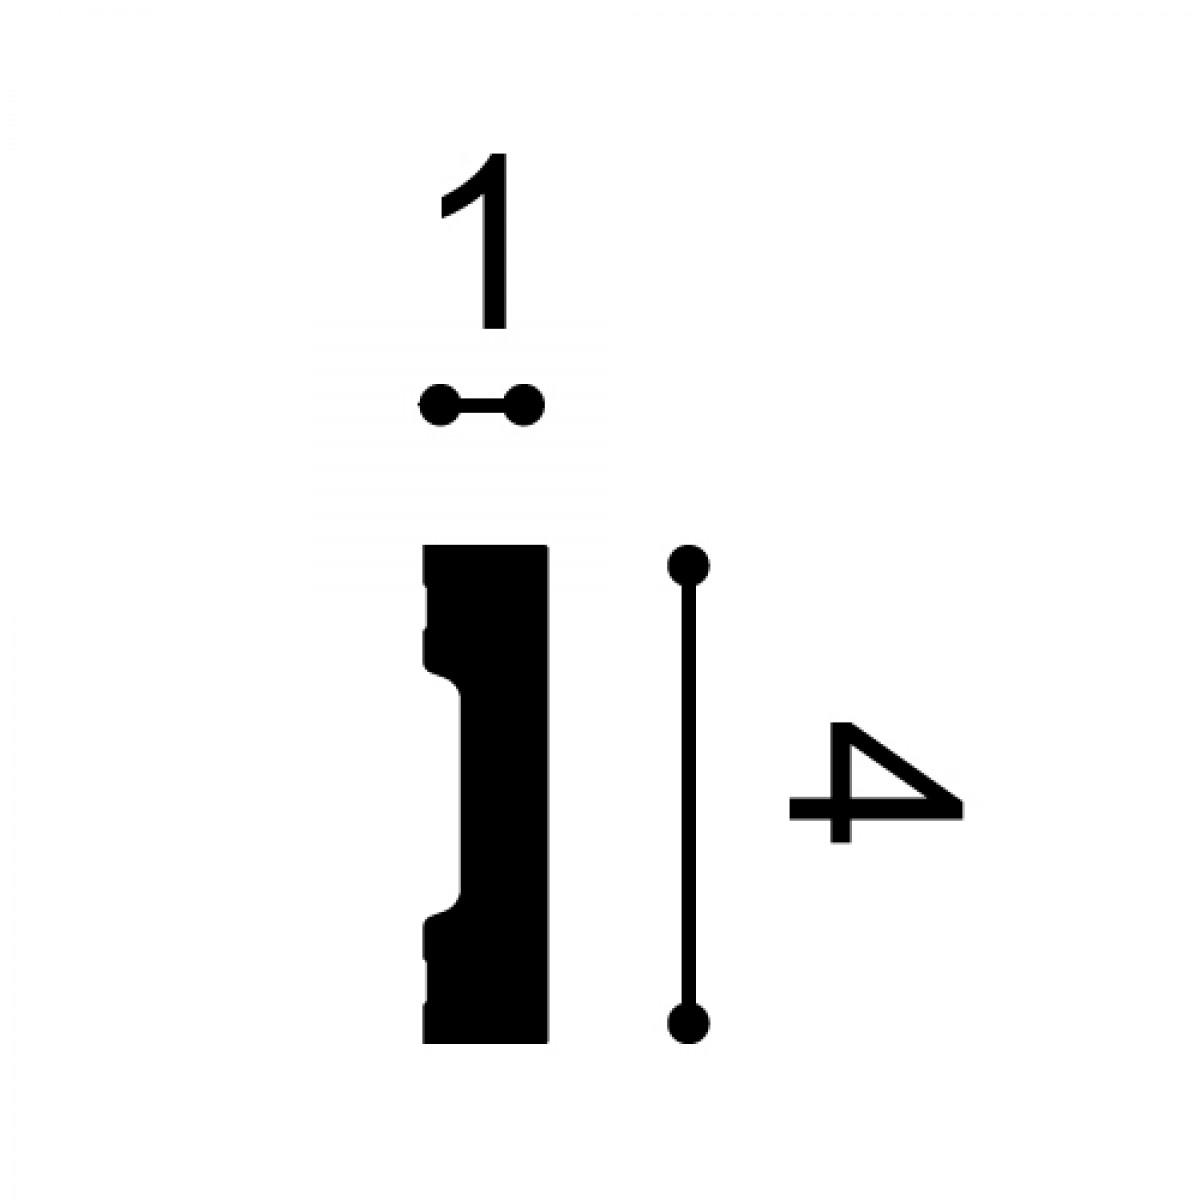 Plintă / Ancadrament Ușă Axxent SX162, Dimensiuni: 200 X 4 X 1 cm, Orac Decor